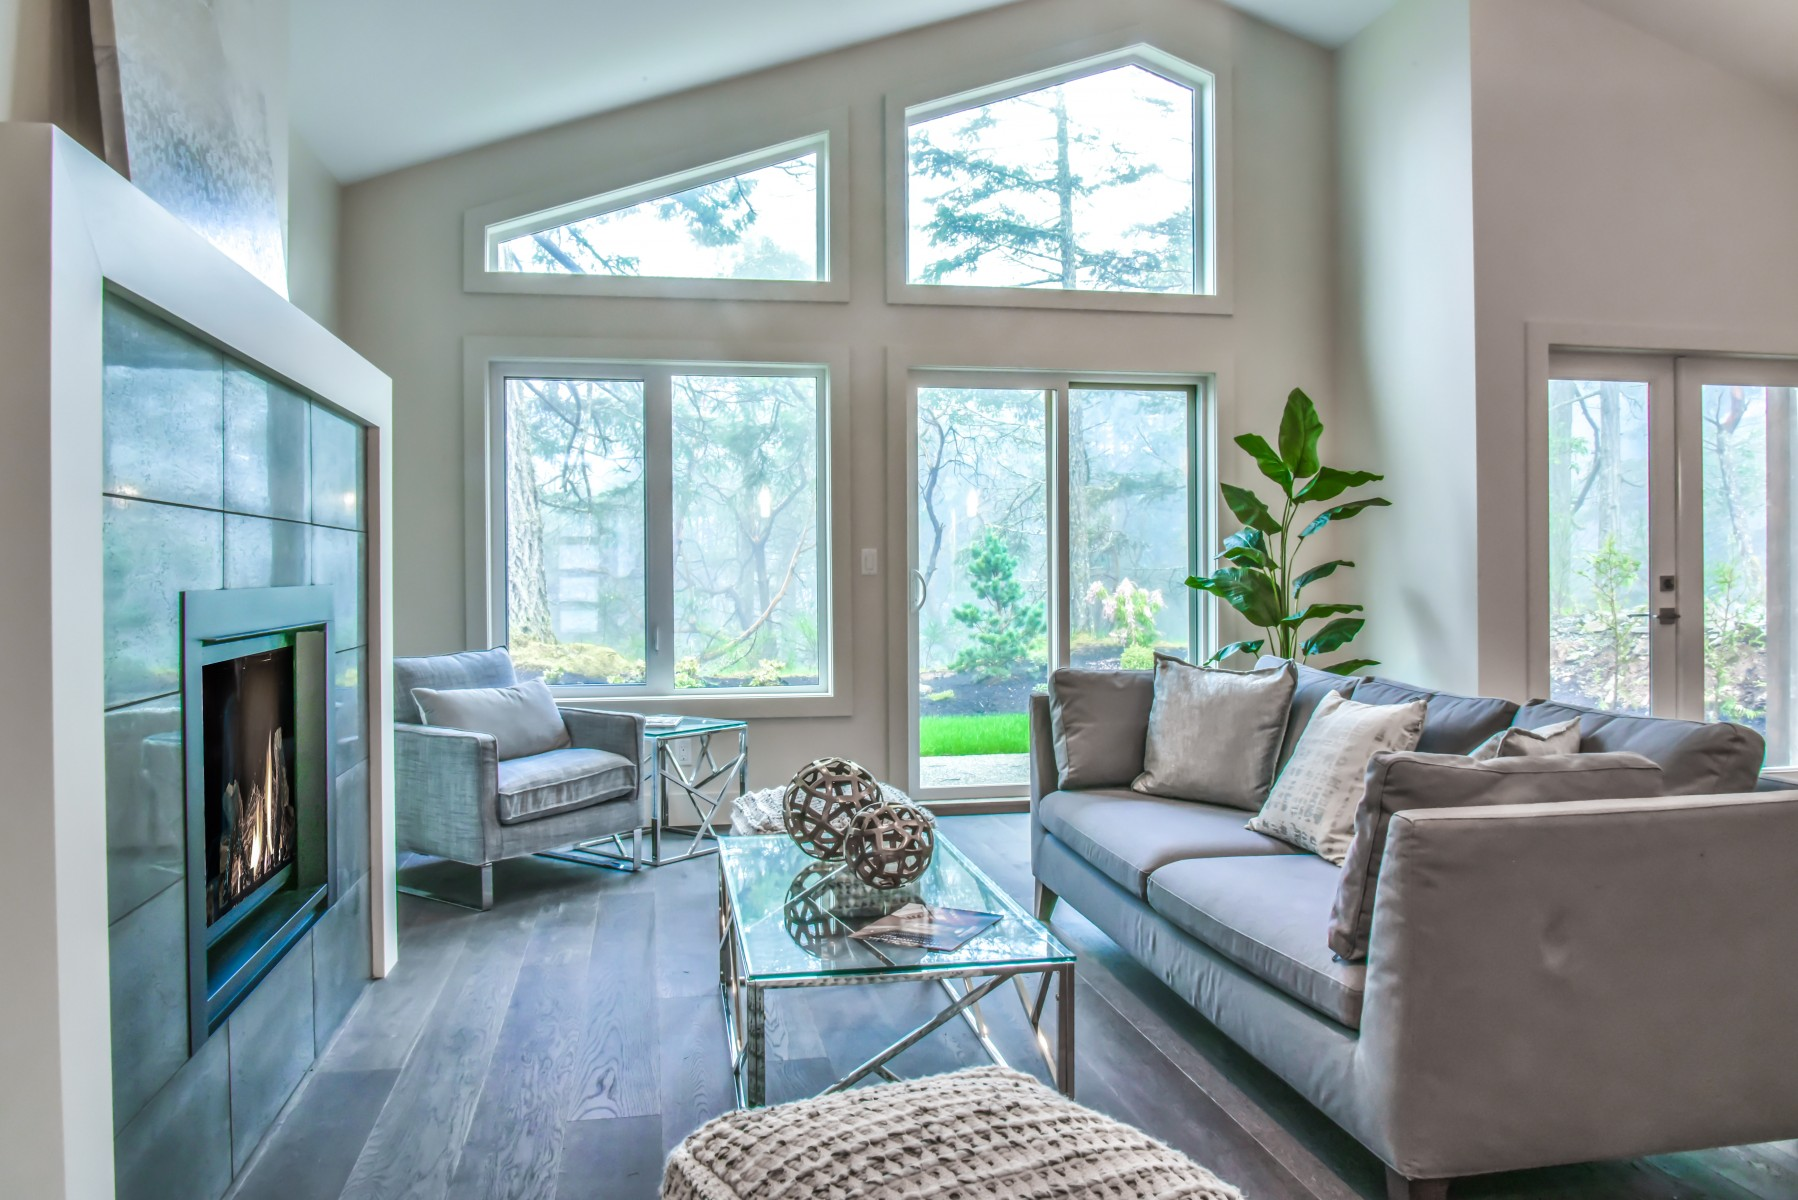 Crestline home - great room